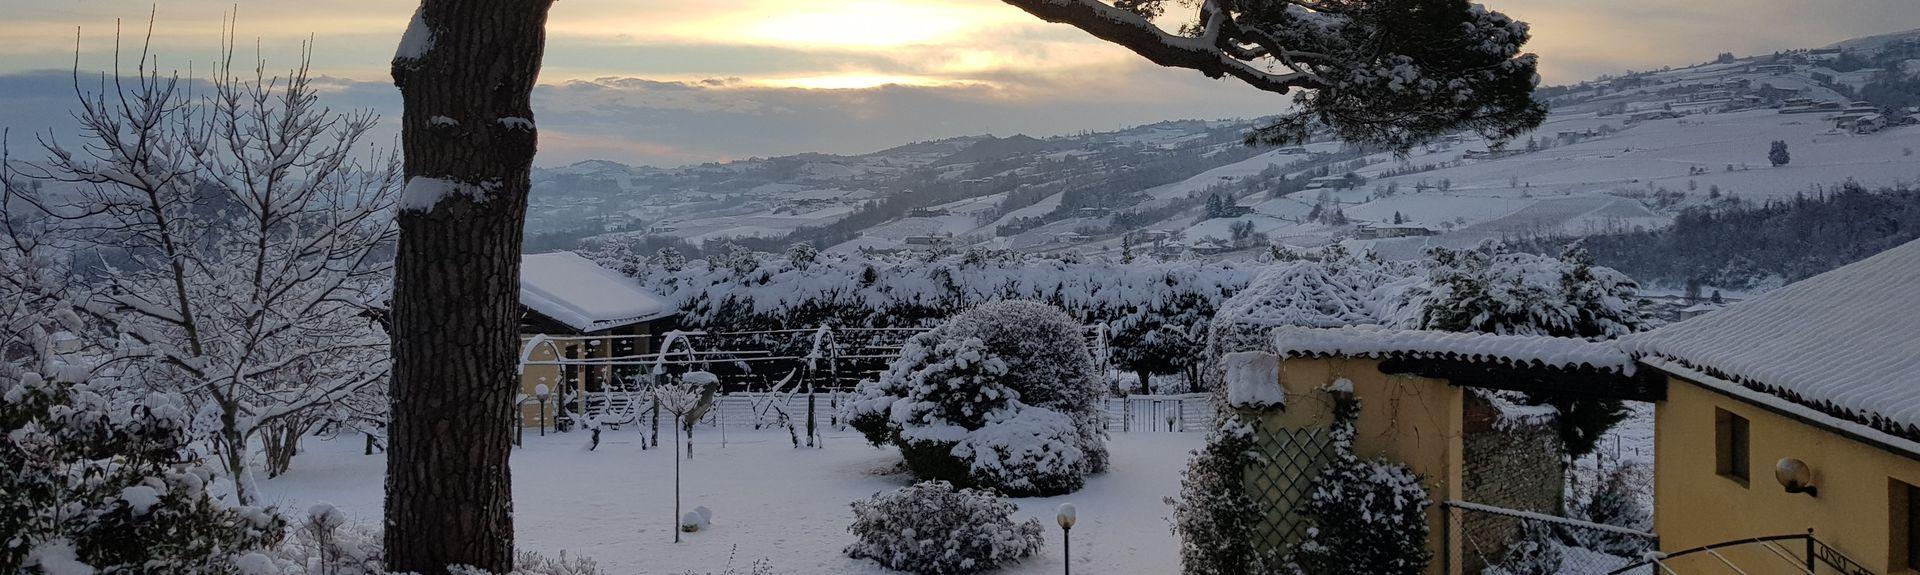 Belveglio, Asti, Piedmont, Italy